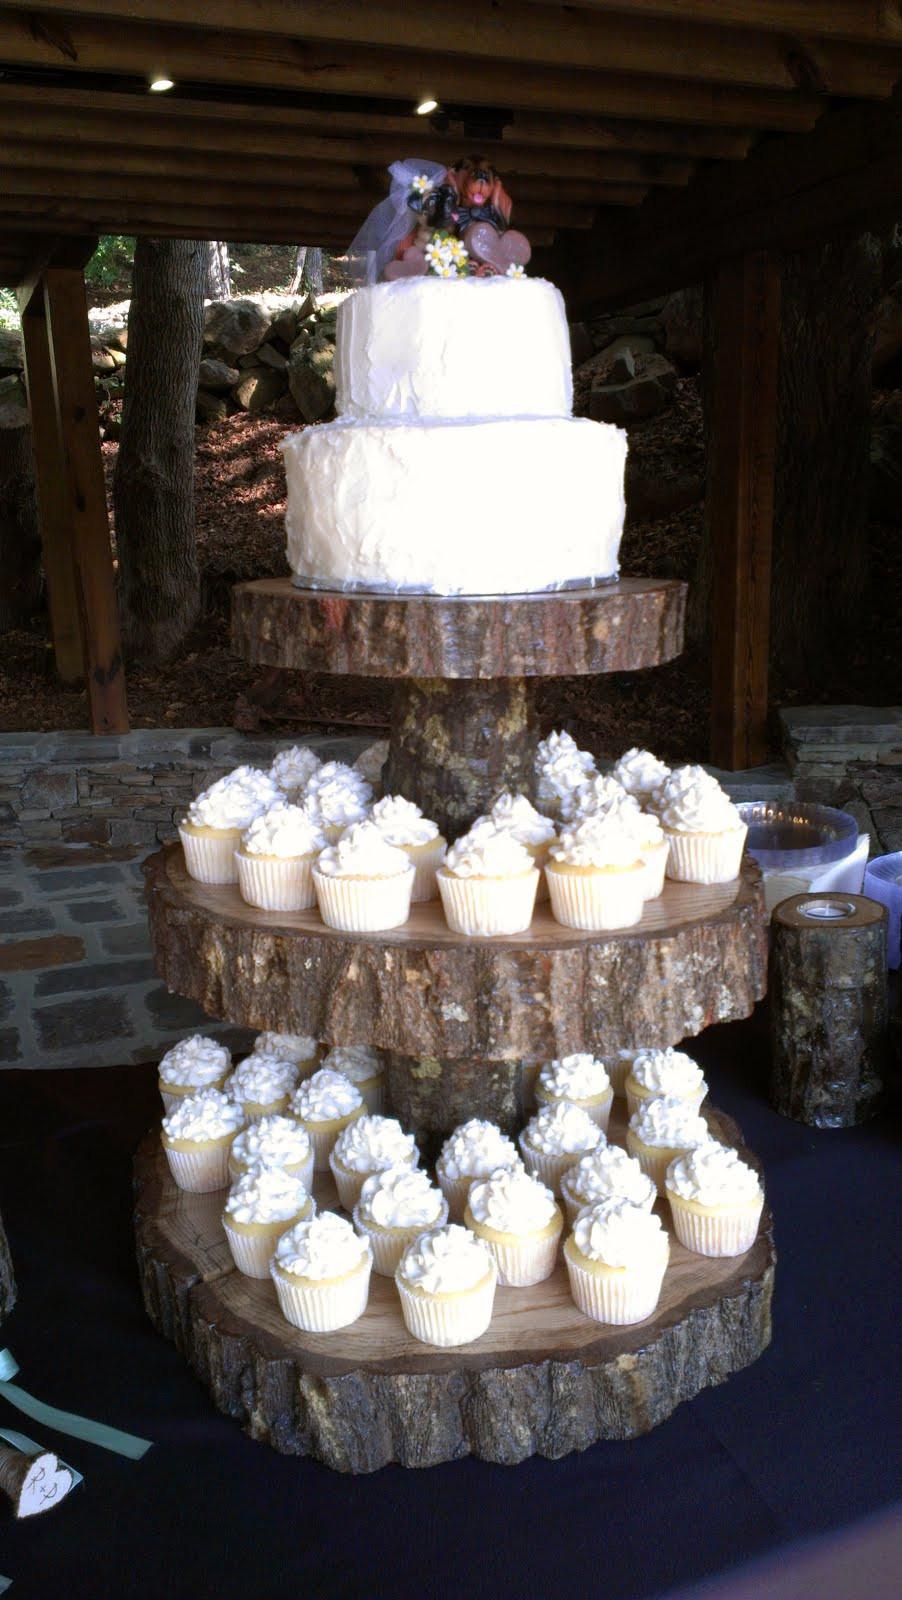 Rustic Wedding Cakes With Cupcakes  Sarah s Sweet Cakes Rustic Wedding Cake & Cupcakes